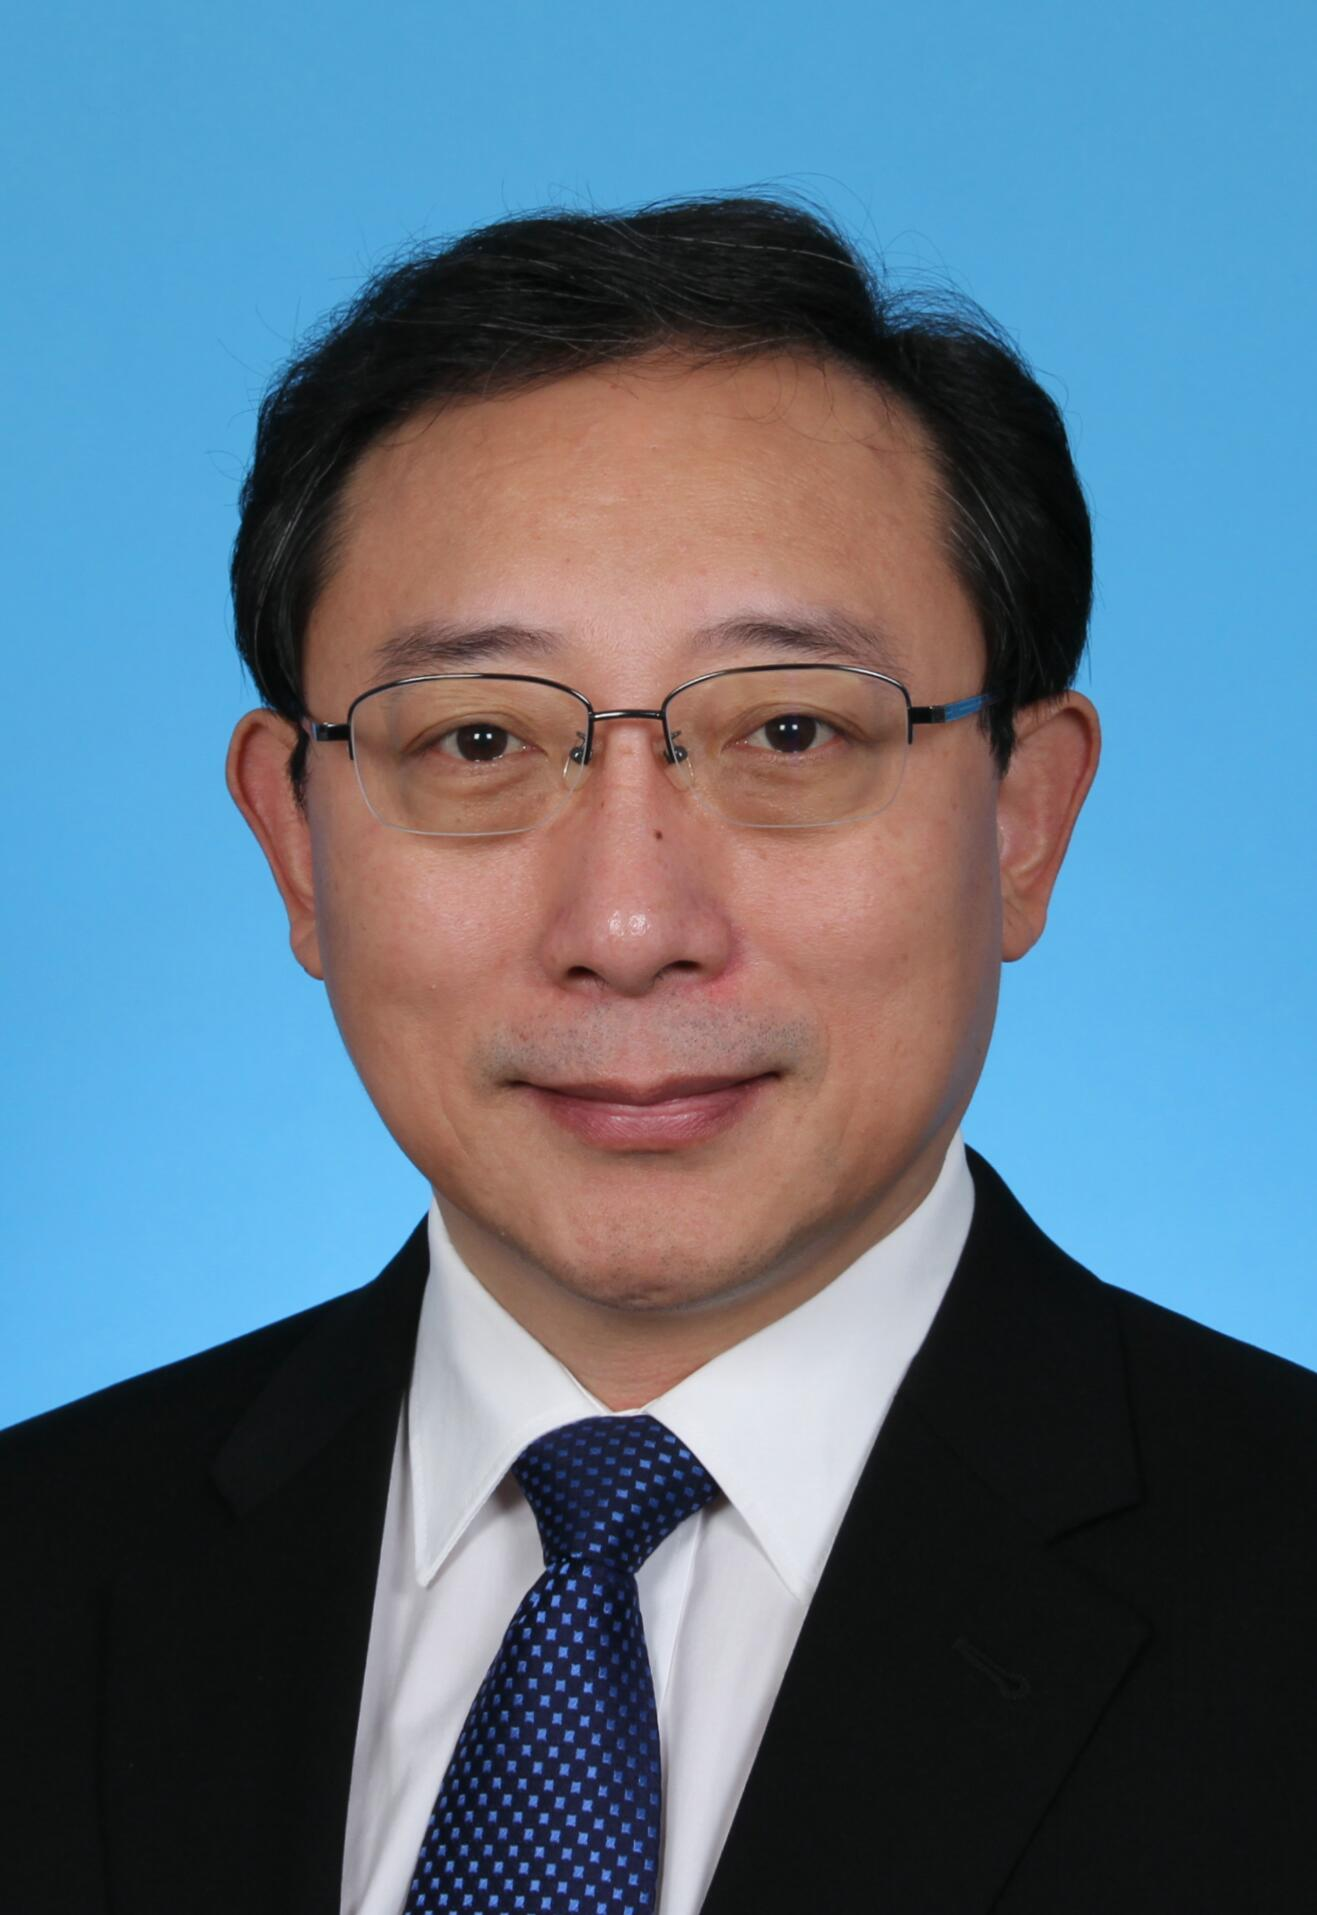 Portrait of Xuetao Cao